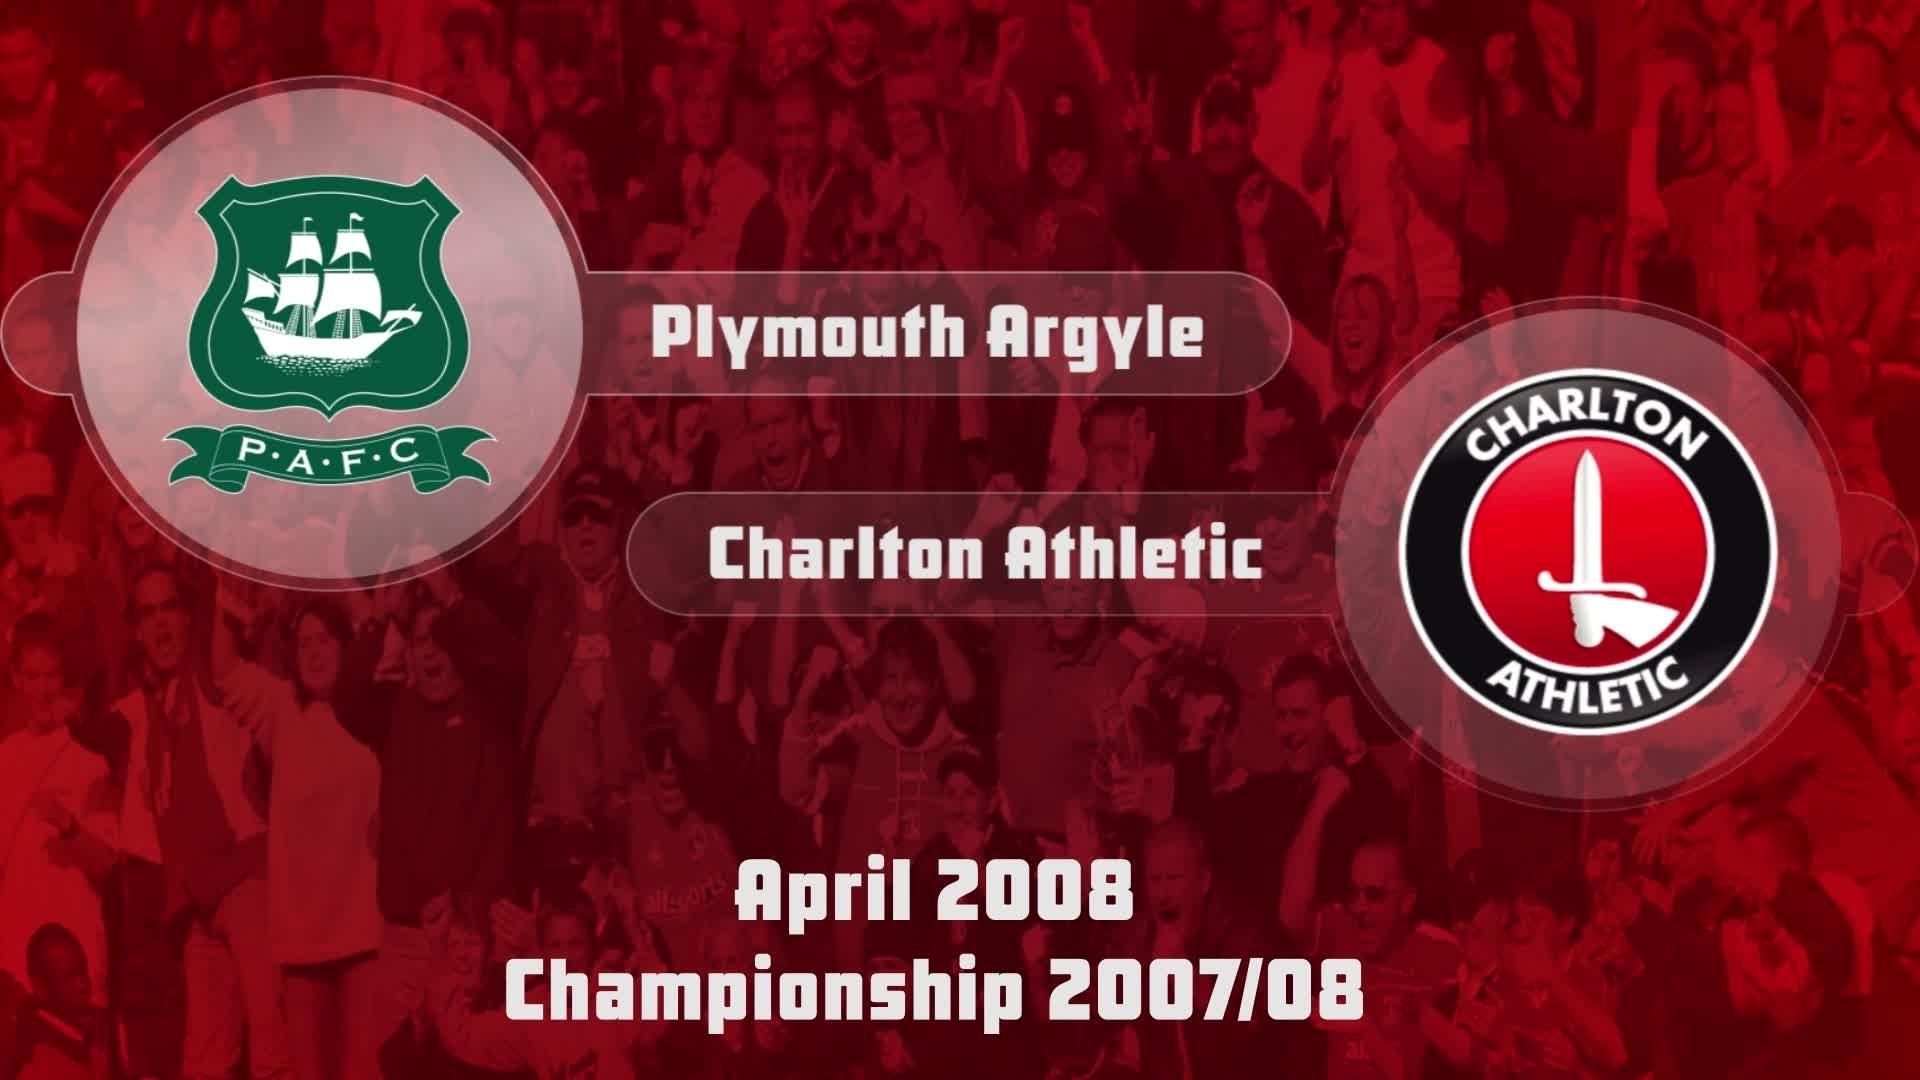 47 HIGHLIGHTS | Plymouth 1 Charlton 2 (April 2008)